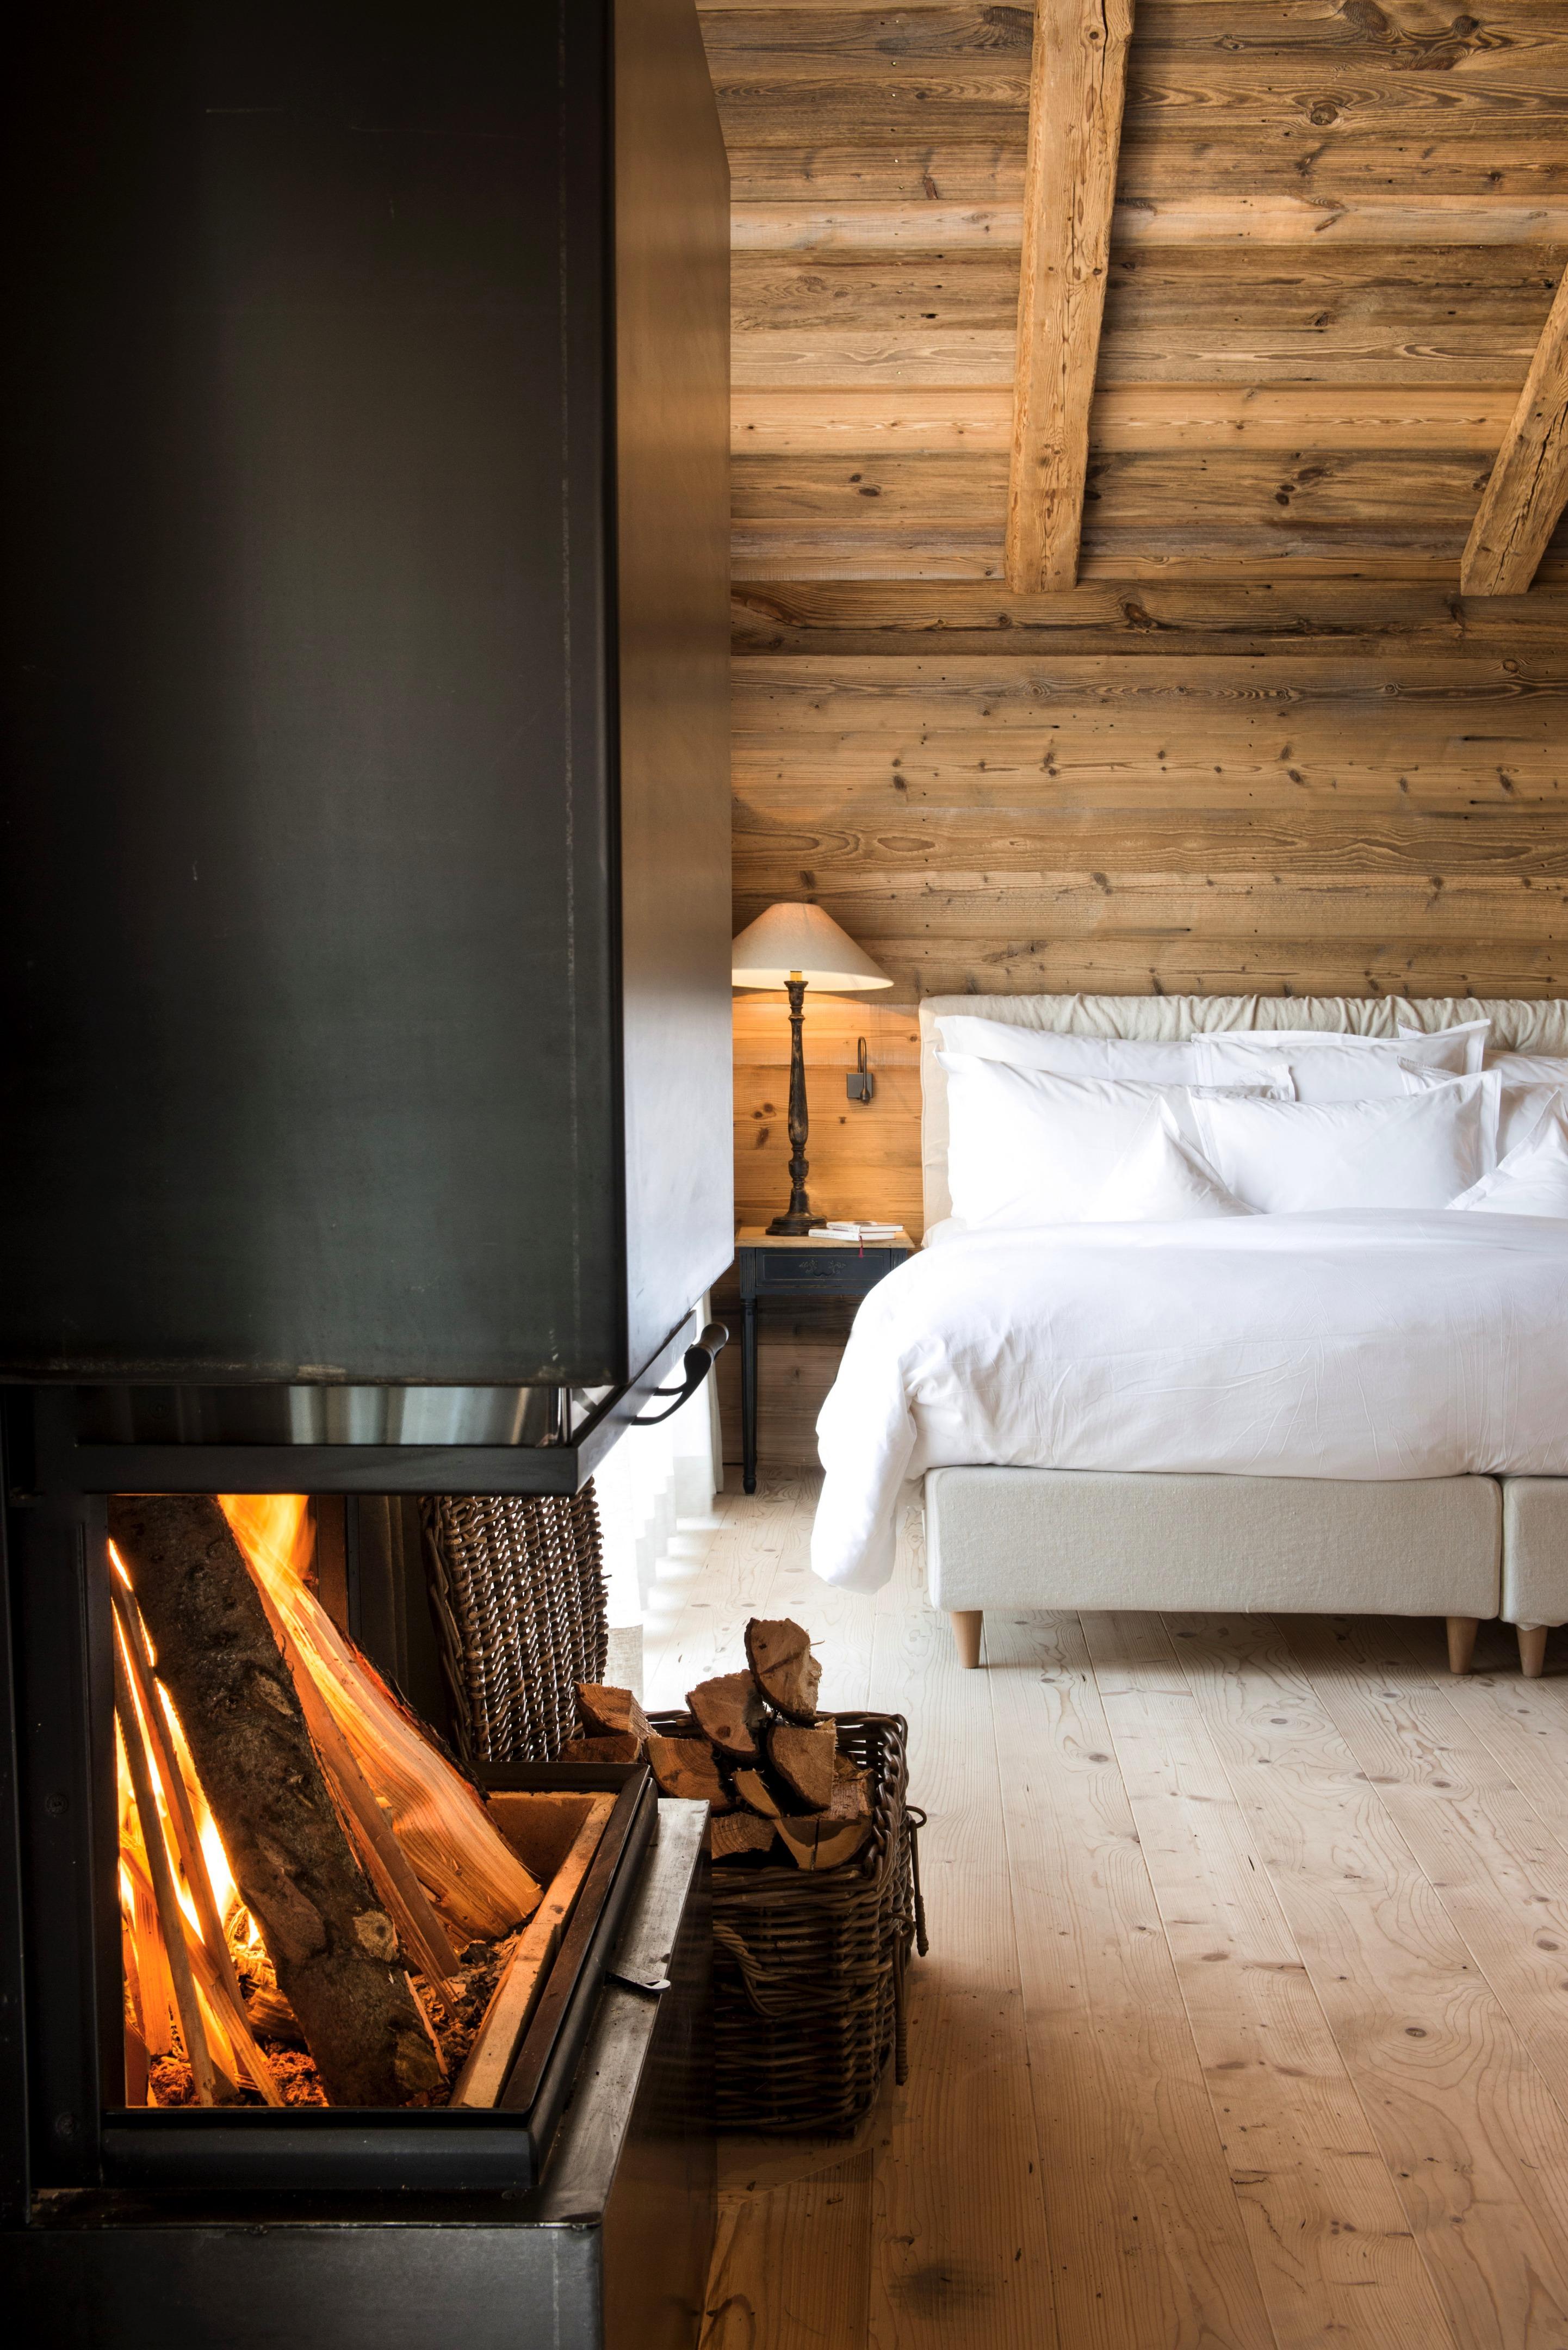 Materassi Merano.San Luis Private Retreat Hotel Lodges Demetzarch Atelier